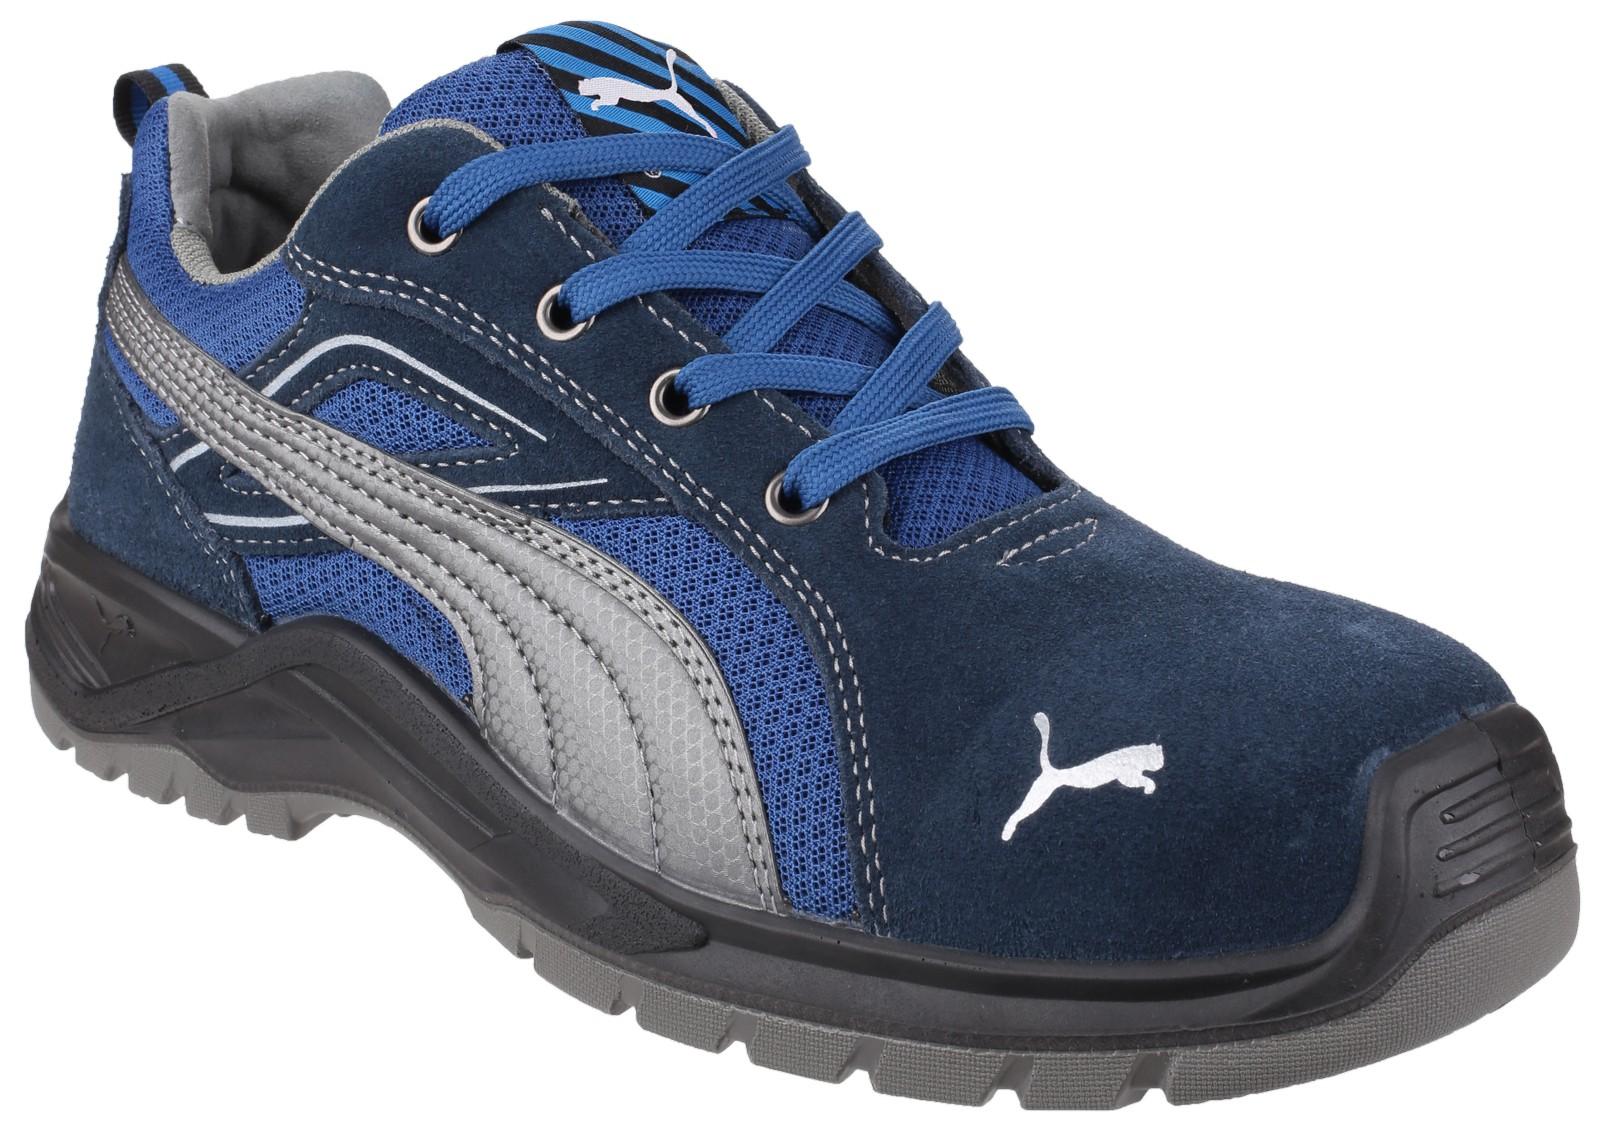 cc25a99ff19 Puma Safety Omni Sky Low Lace up Safety Shoe